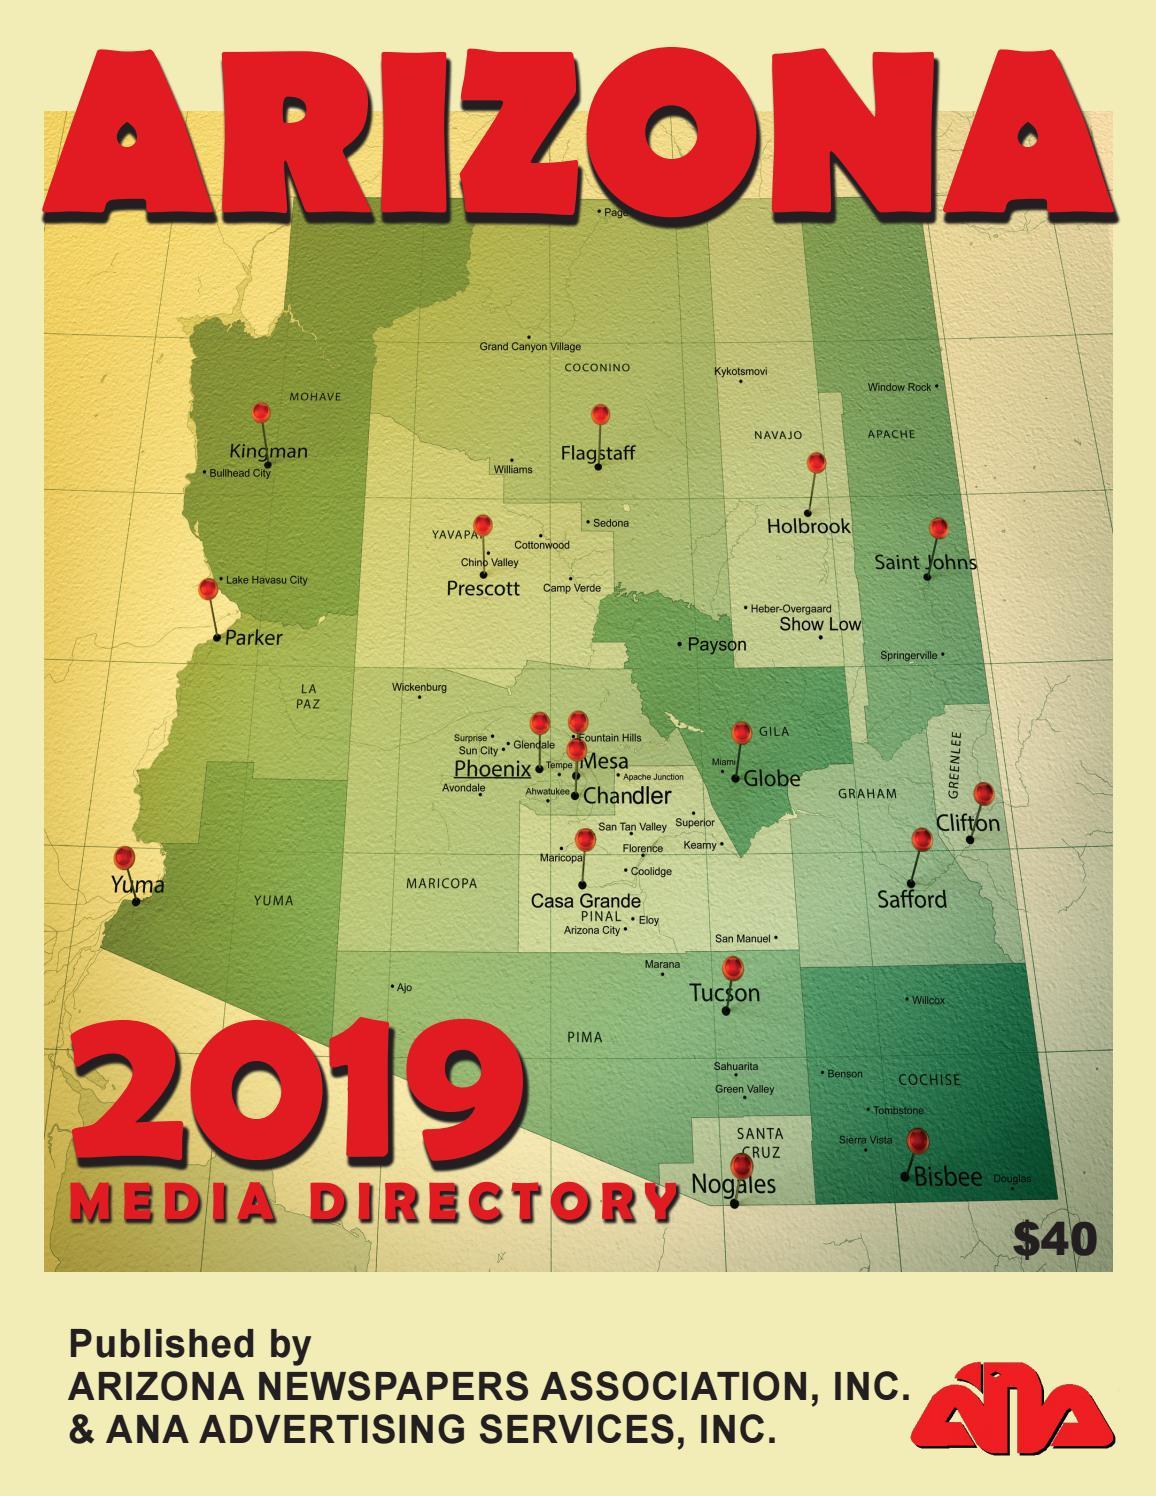 2019 ANA Media Directory by Arizona Newspapers Association